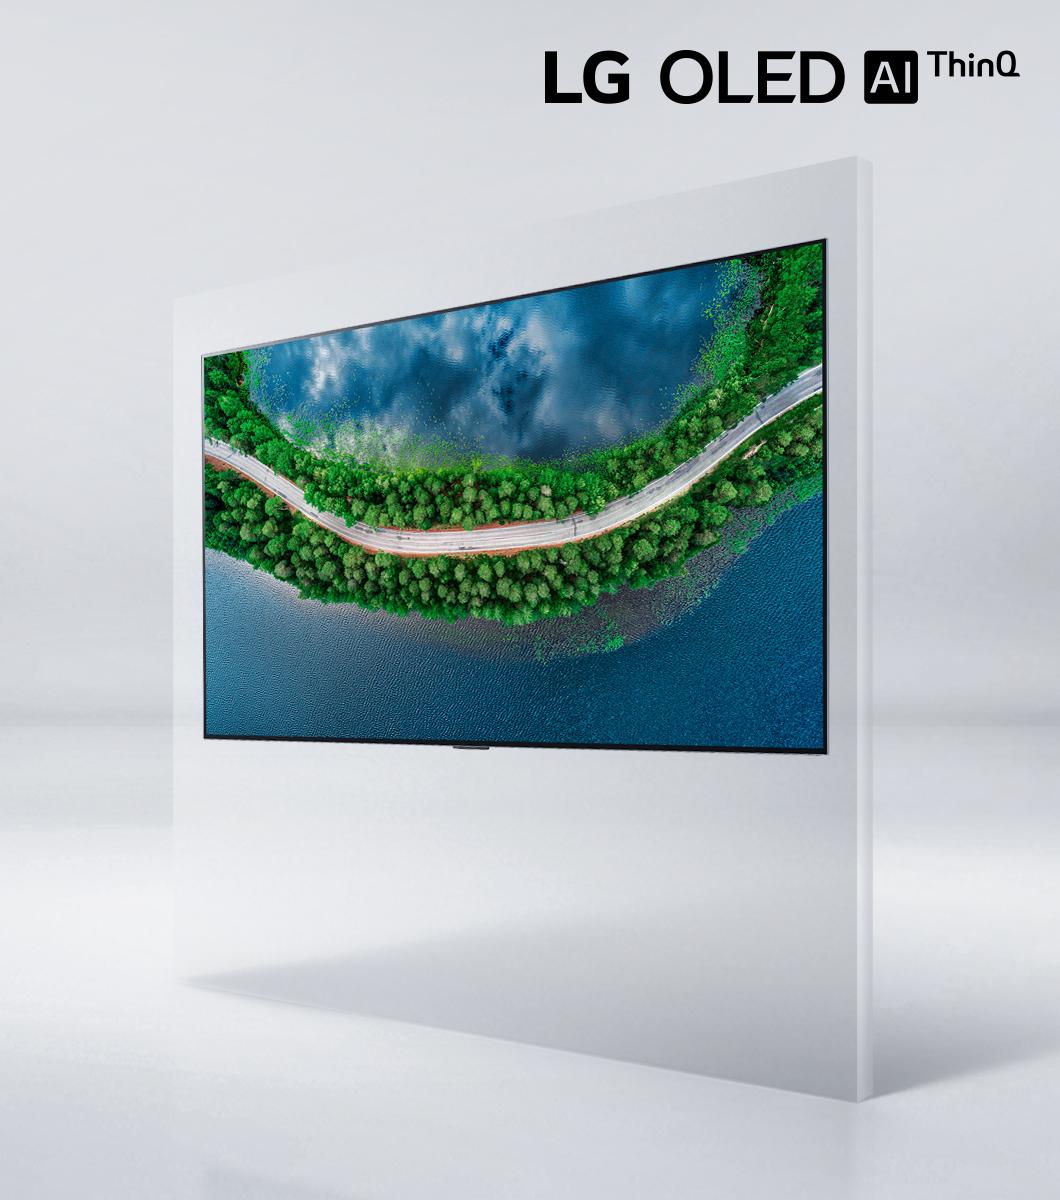 lg telewizory 2020